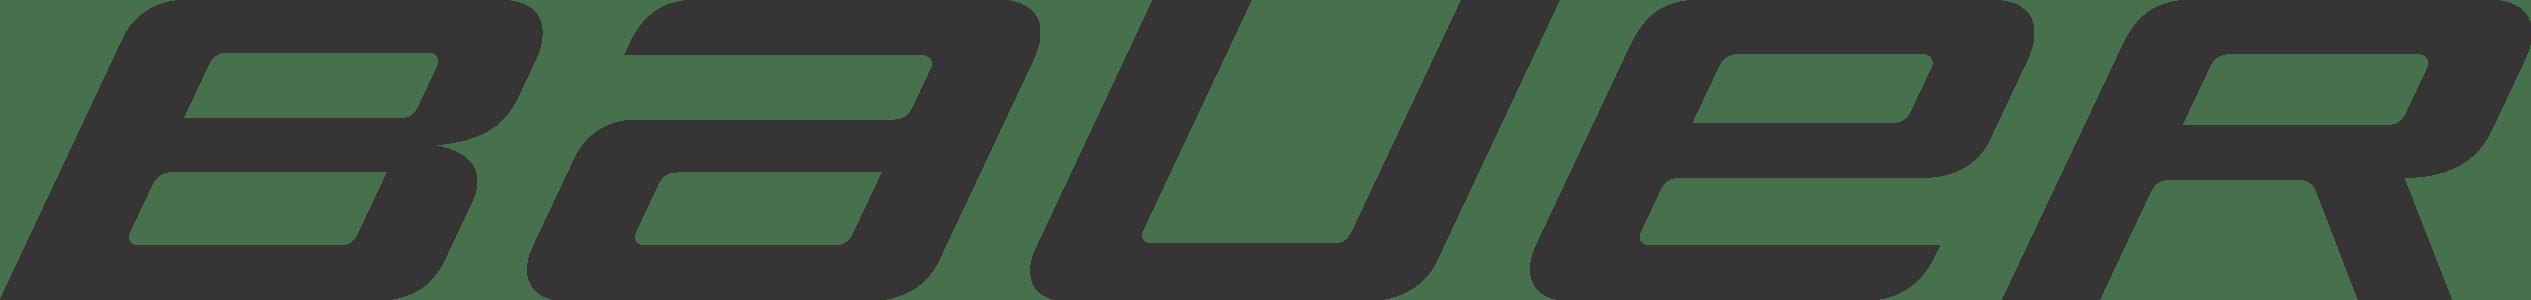 Bauer Logo [Hockey] png